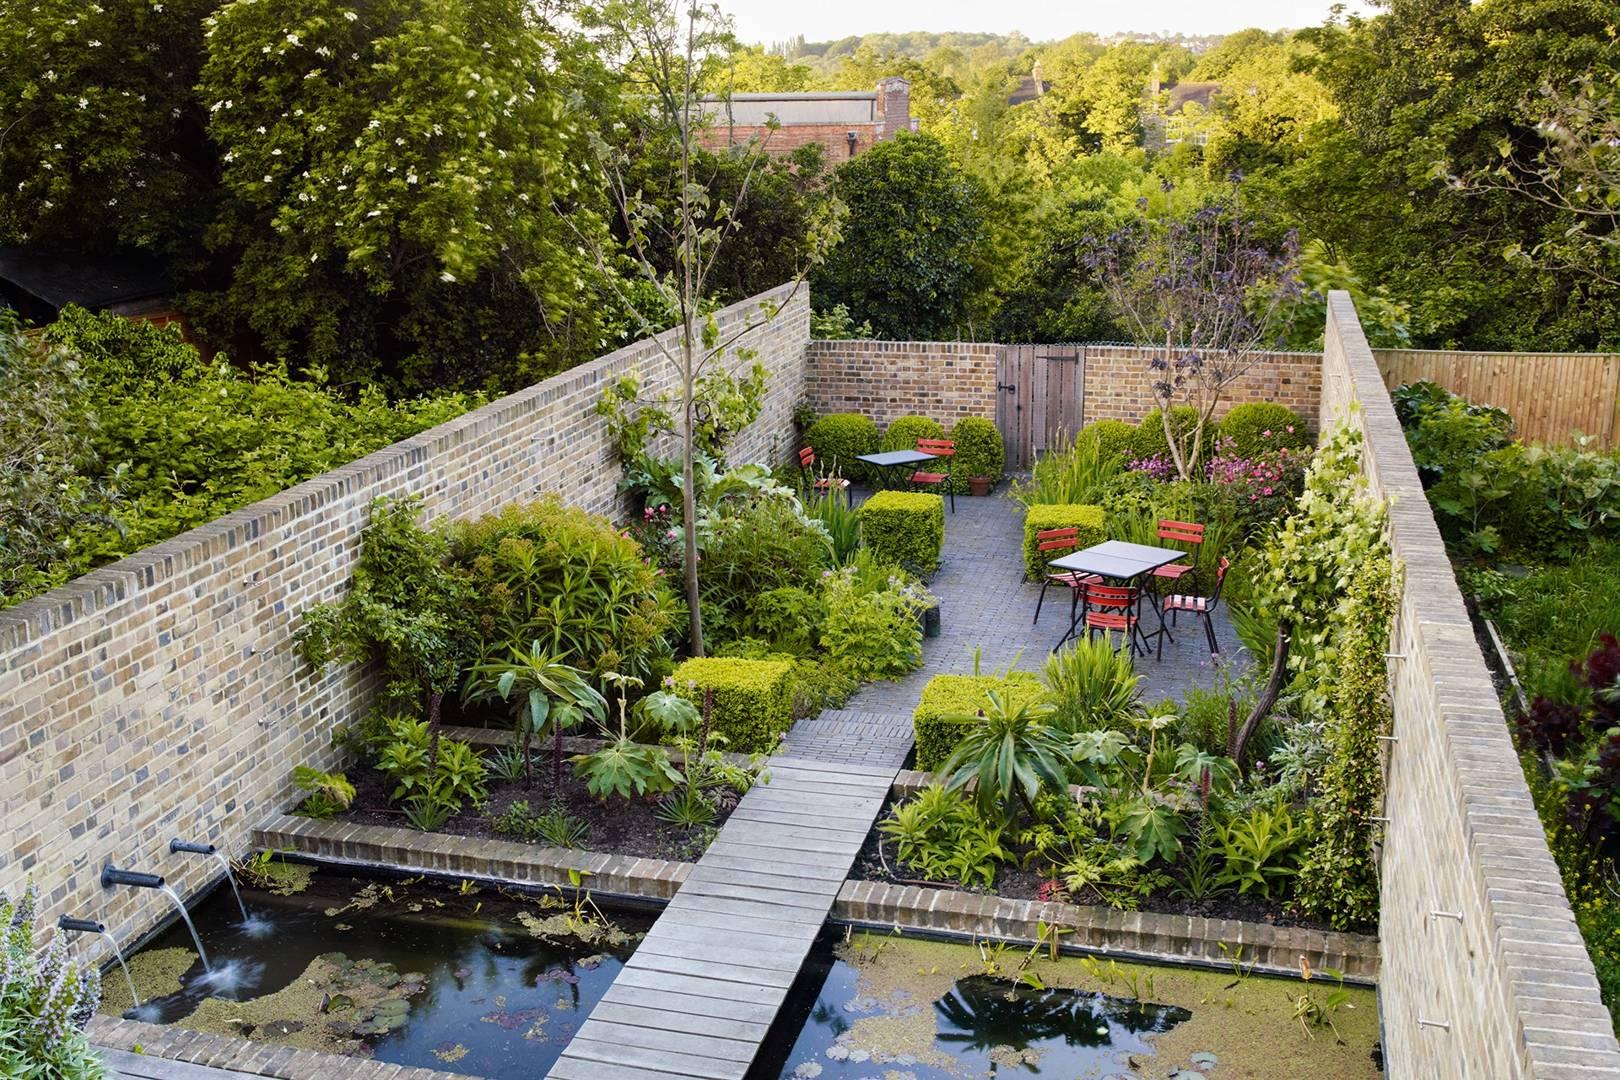 Wooden Decking | Garden Design Ideas | House & Garden